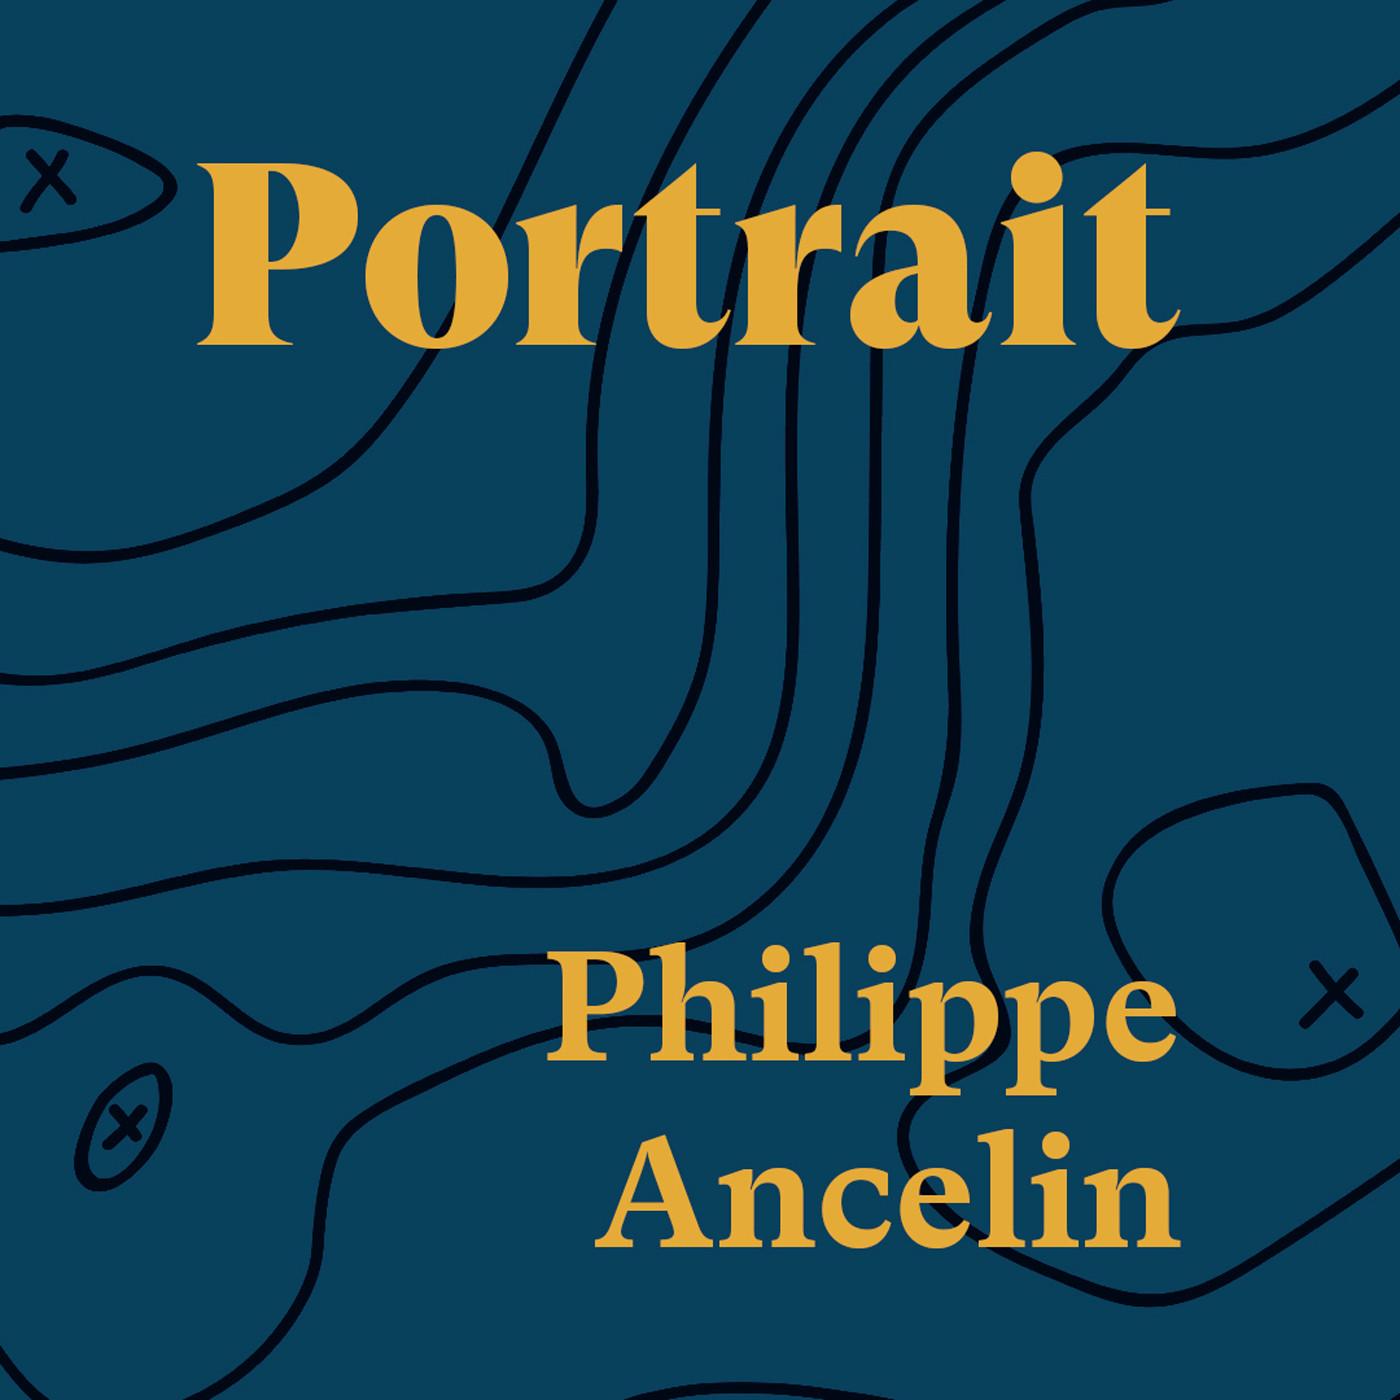 Portrait Philippe Ancelin